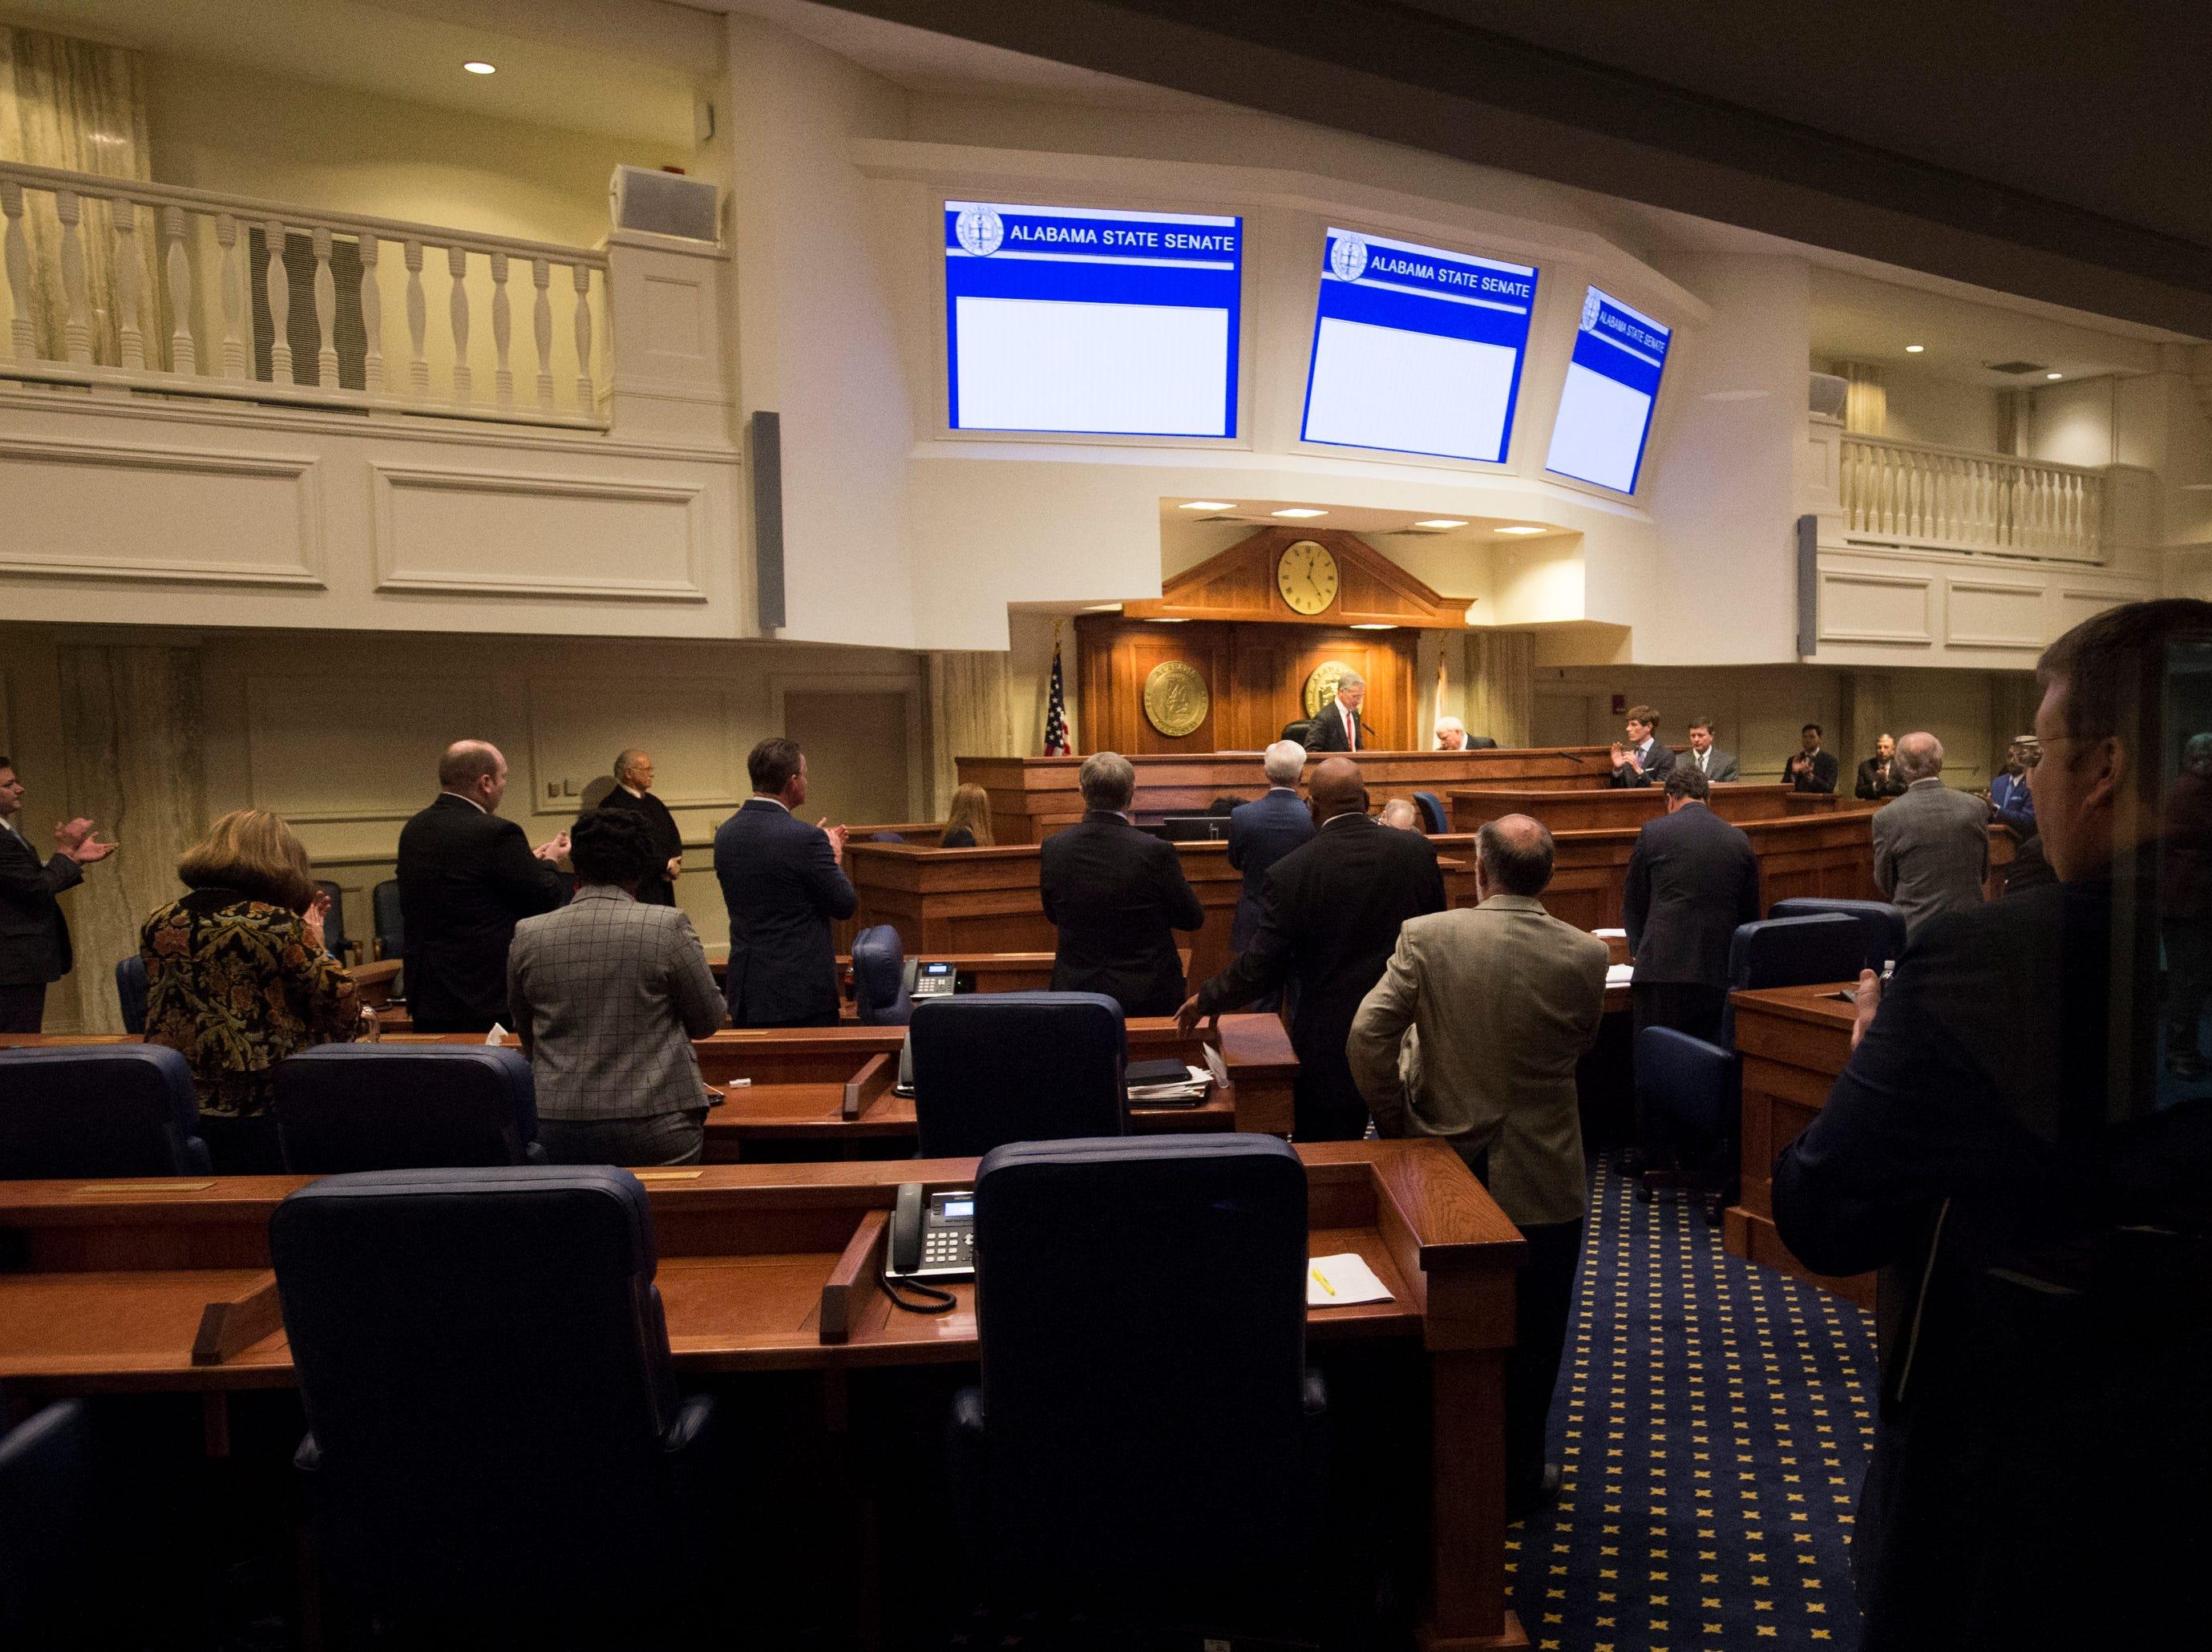 The Alabama State Senate during the 2019 Alabama Legislature's organizational session at the Alabama State House in Montgomery, Ala., on Tuesday, Jan. 8, 2019.